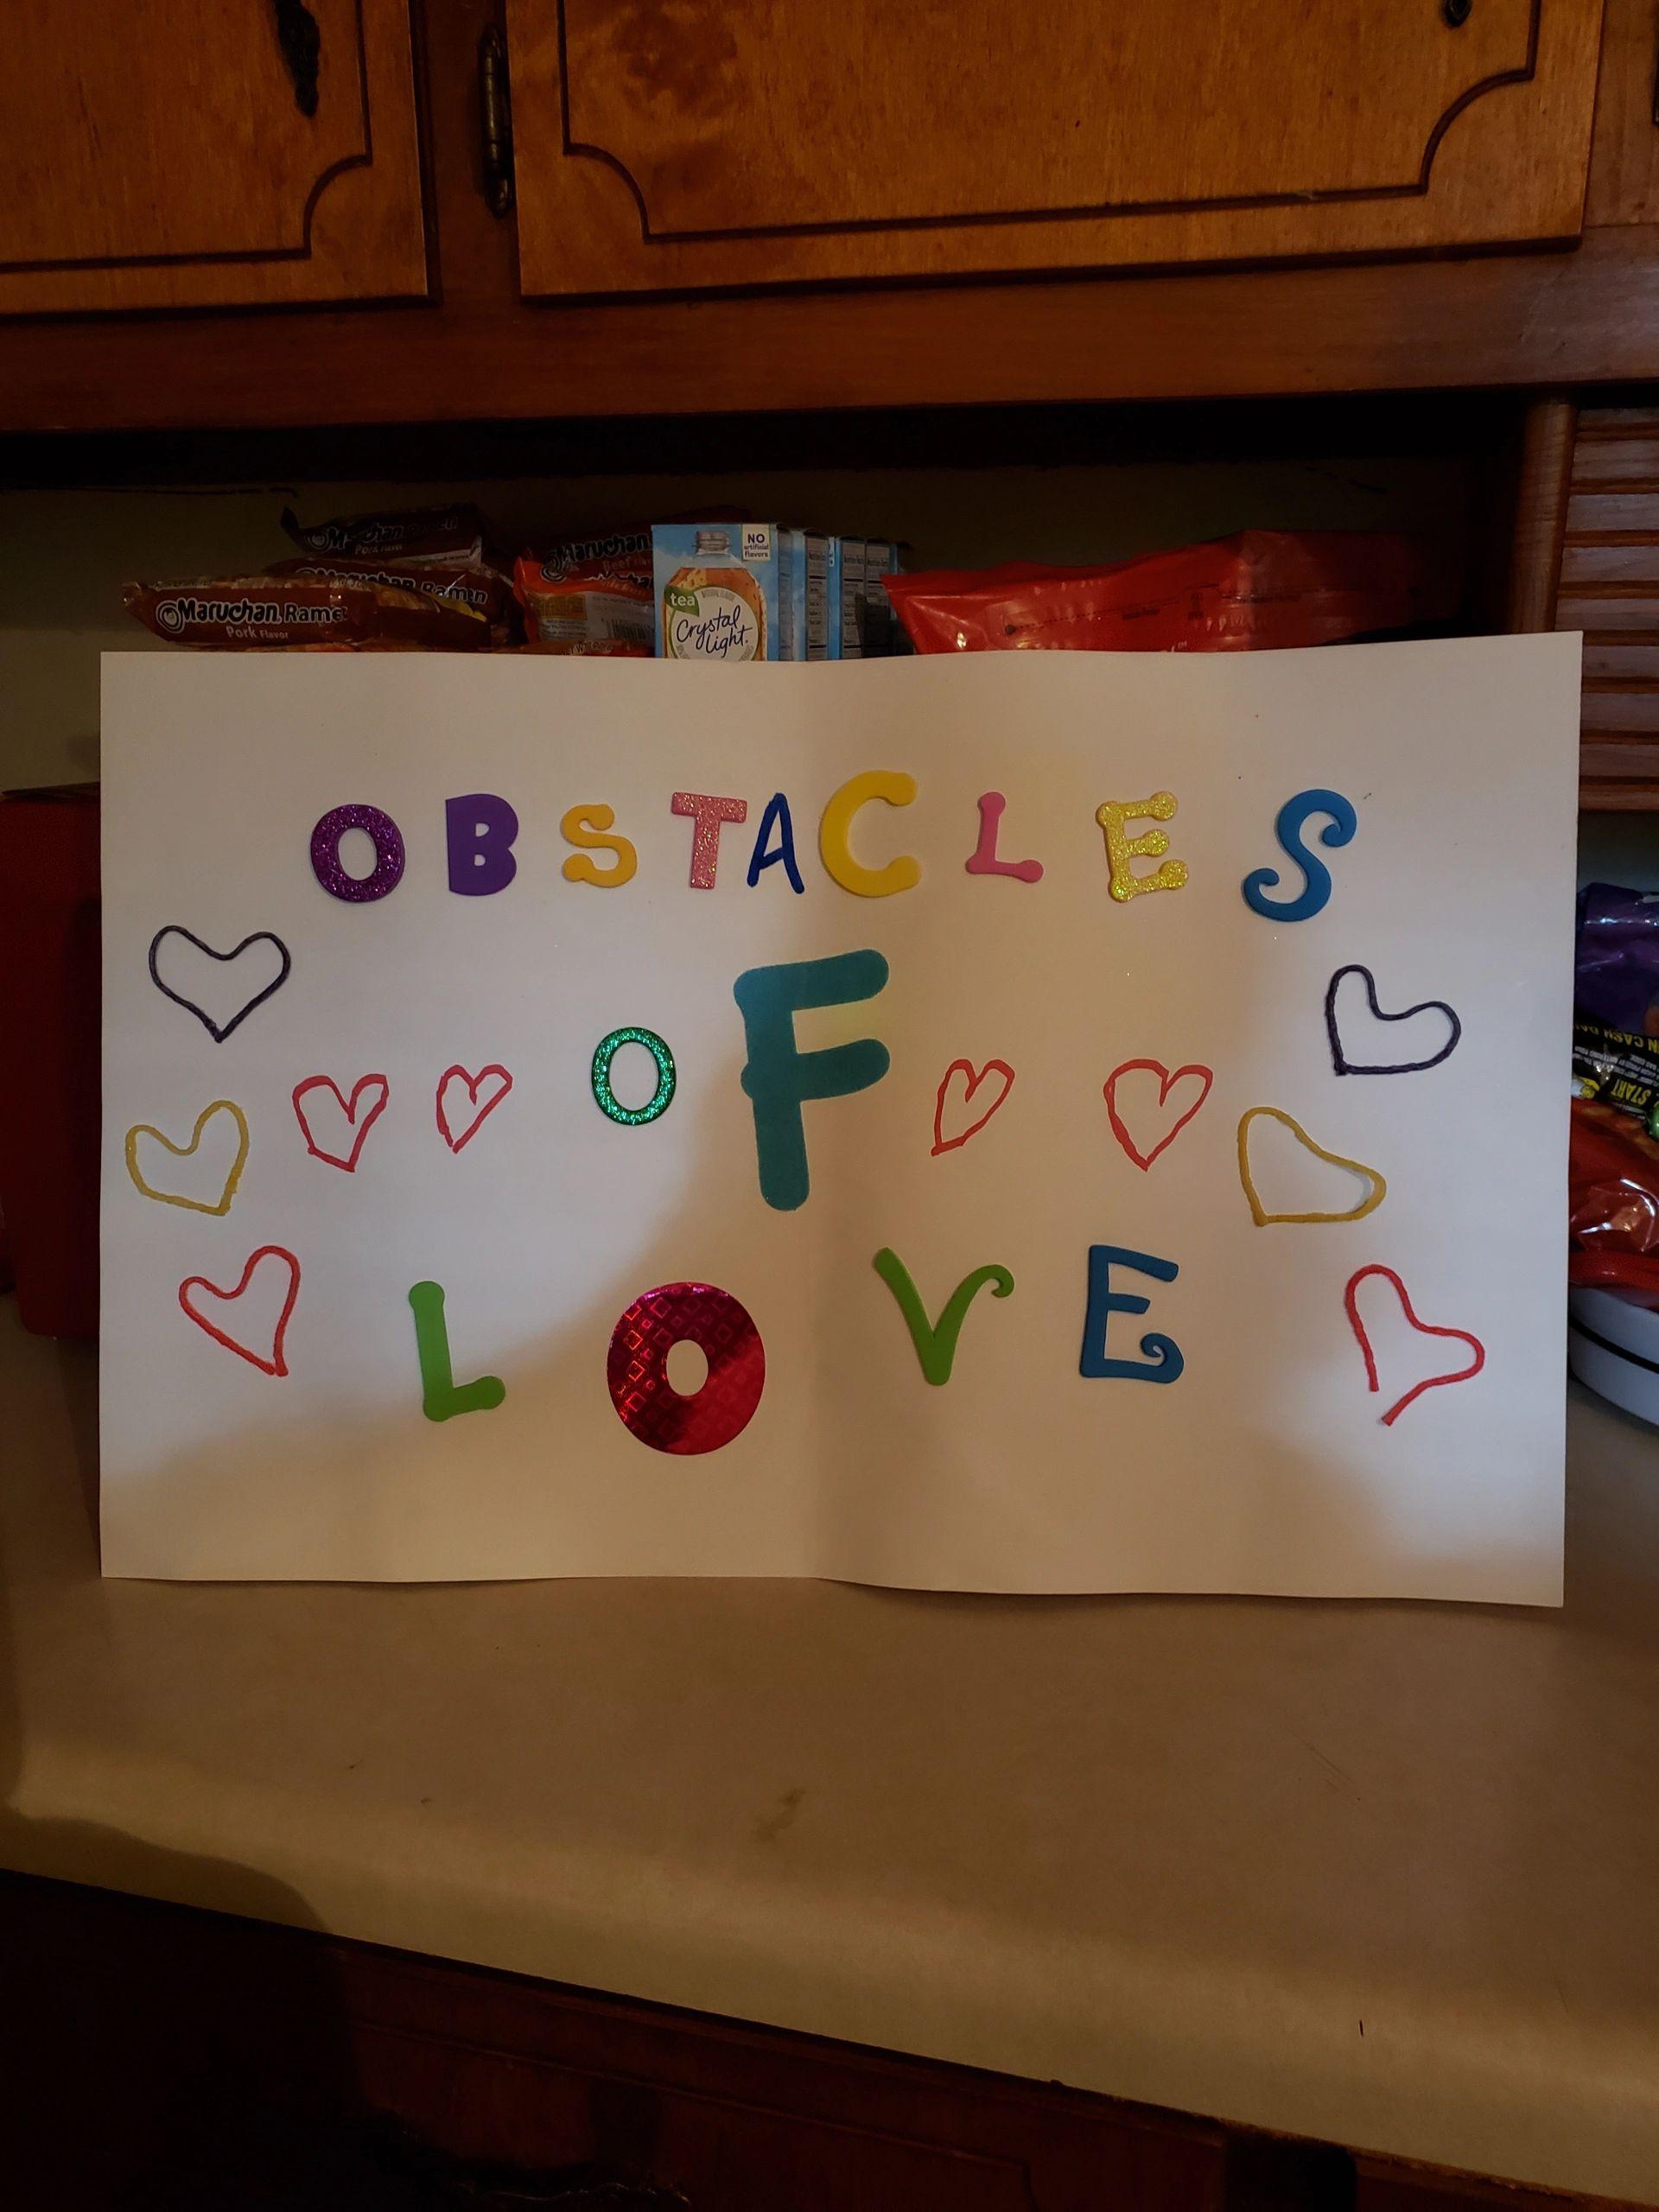 F&Q'S | OBSTACLESOFLOVE